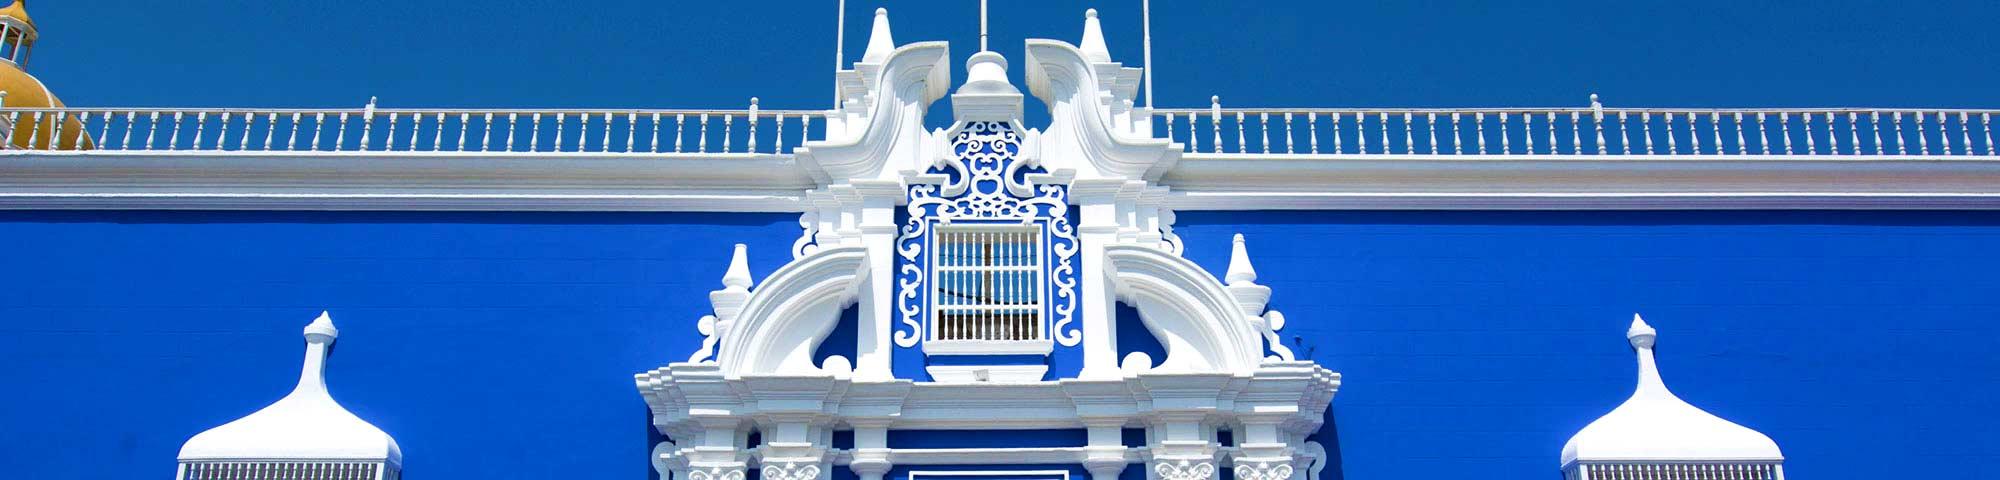 Casa Ganoza Chopitea o Ramírez y Laredo